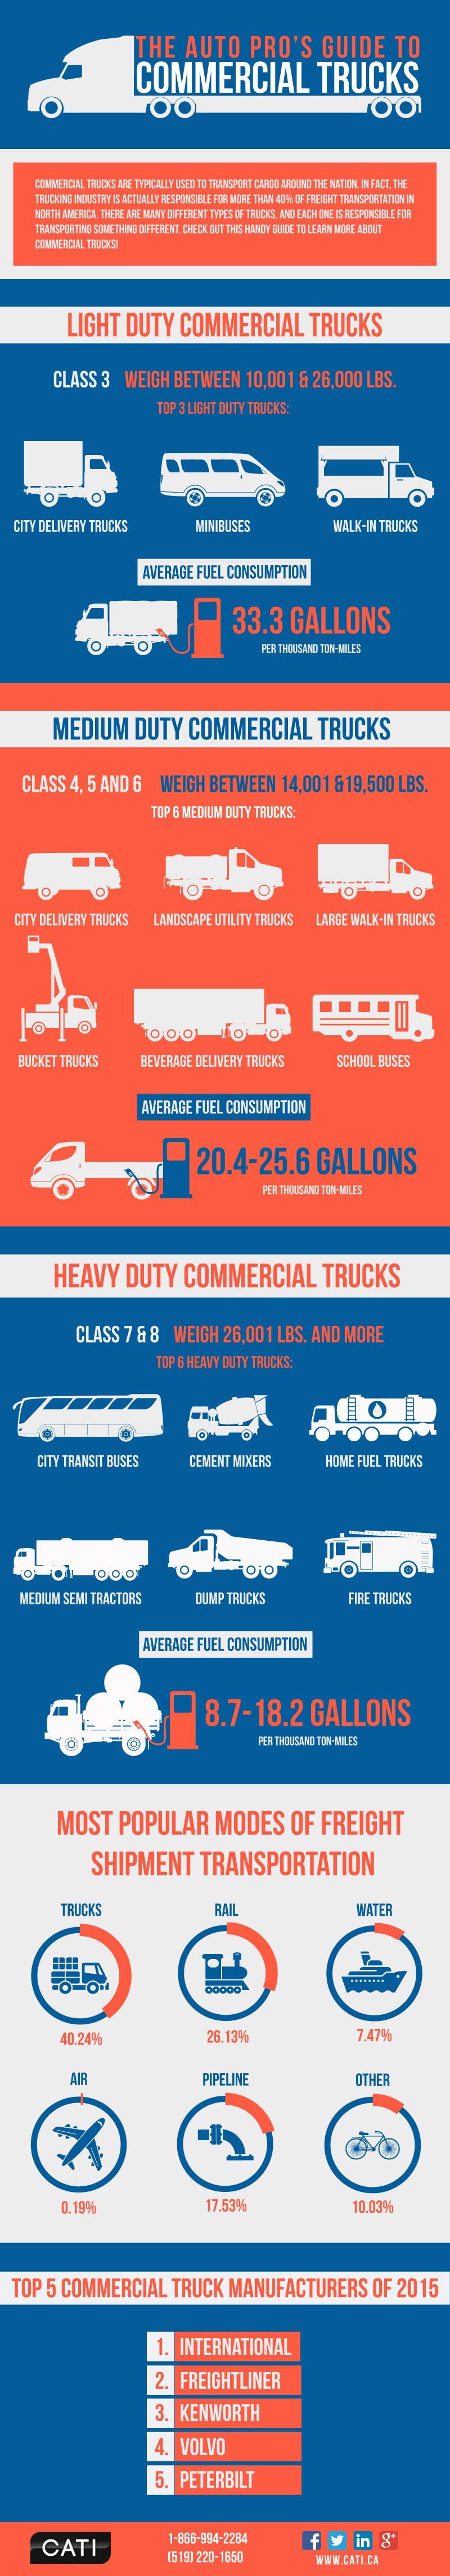 CATI-Infographic